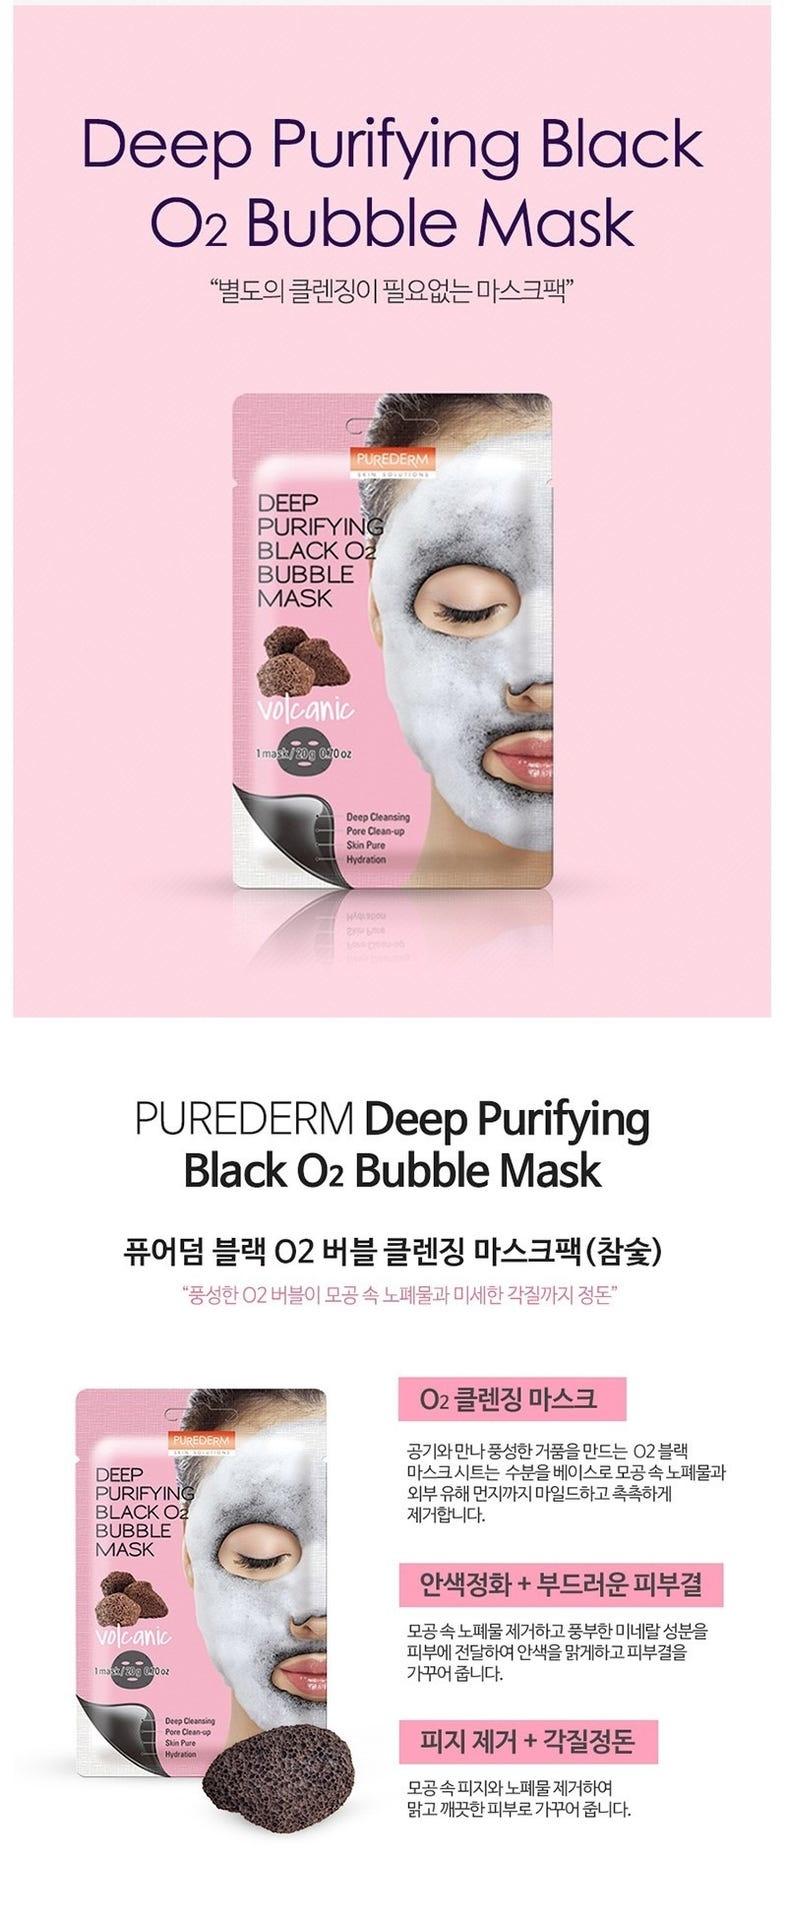 Deep Purifying Black O2 Bubble Mask (Volcanic)-2